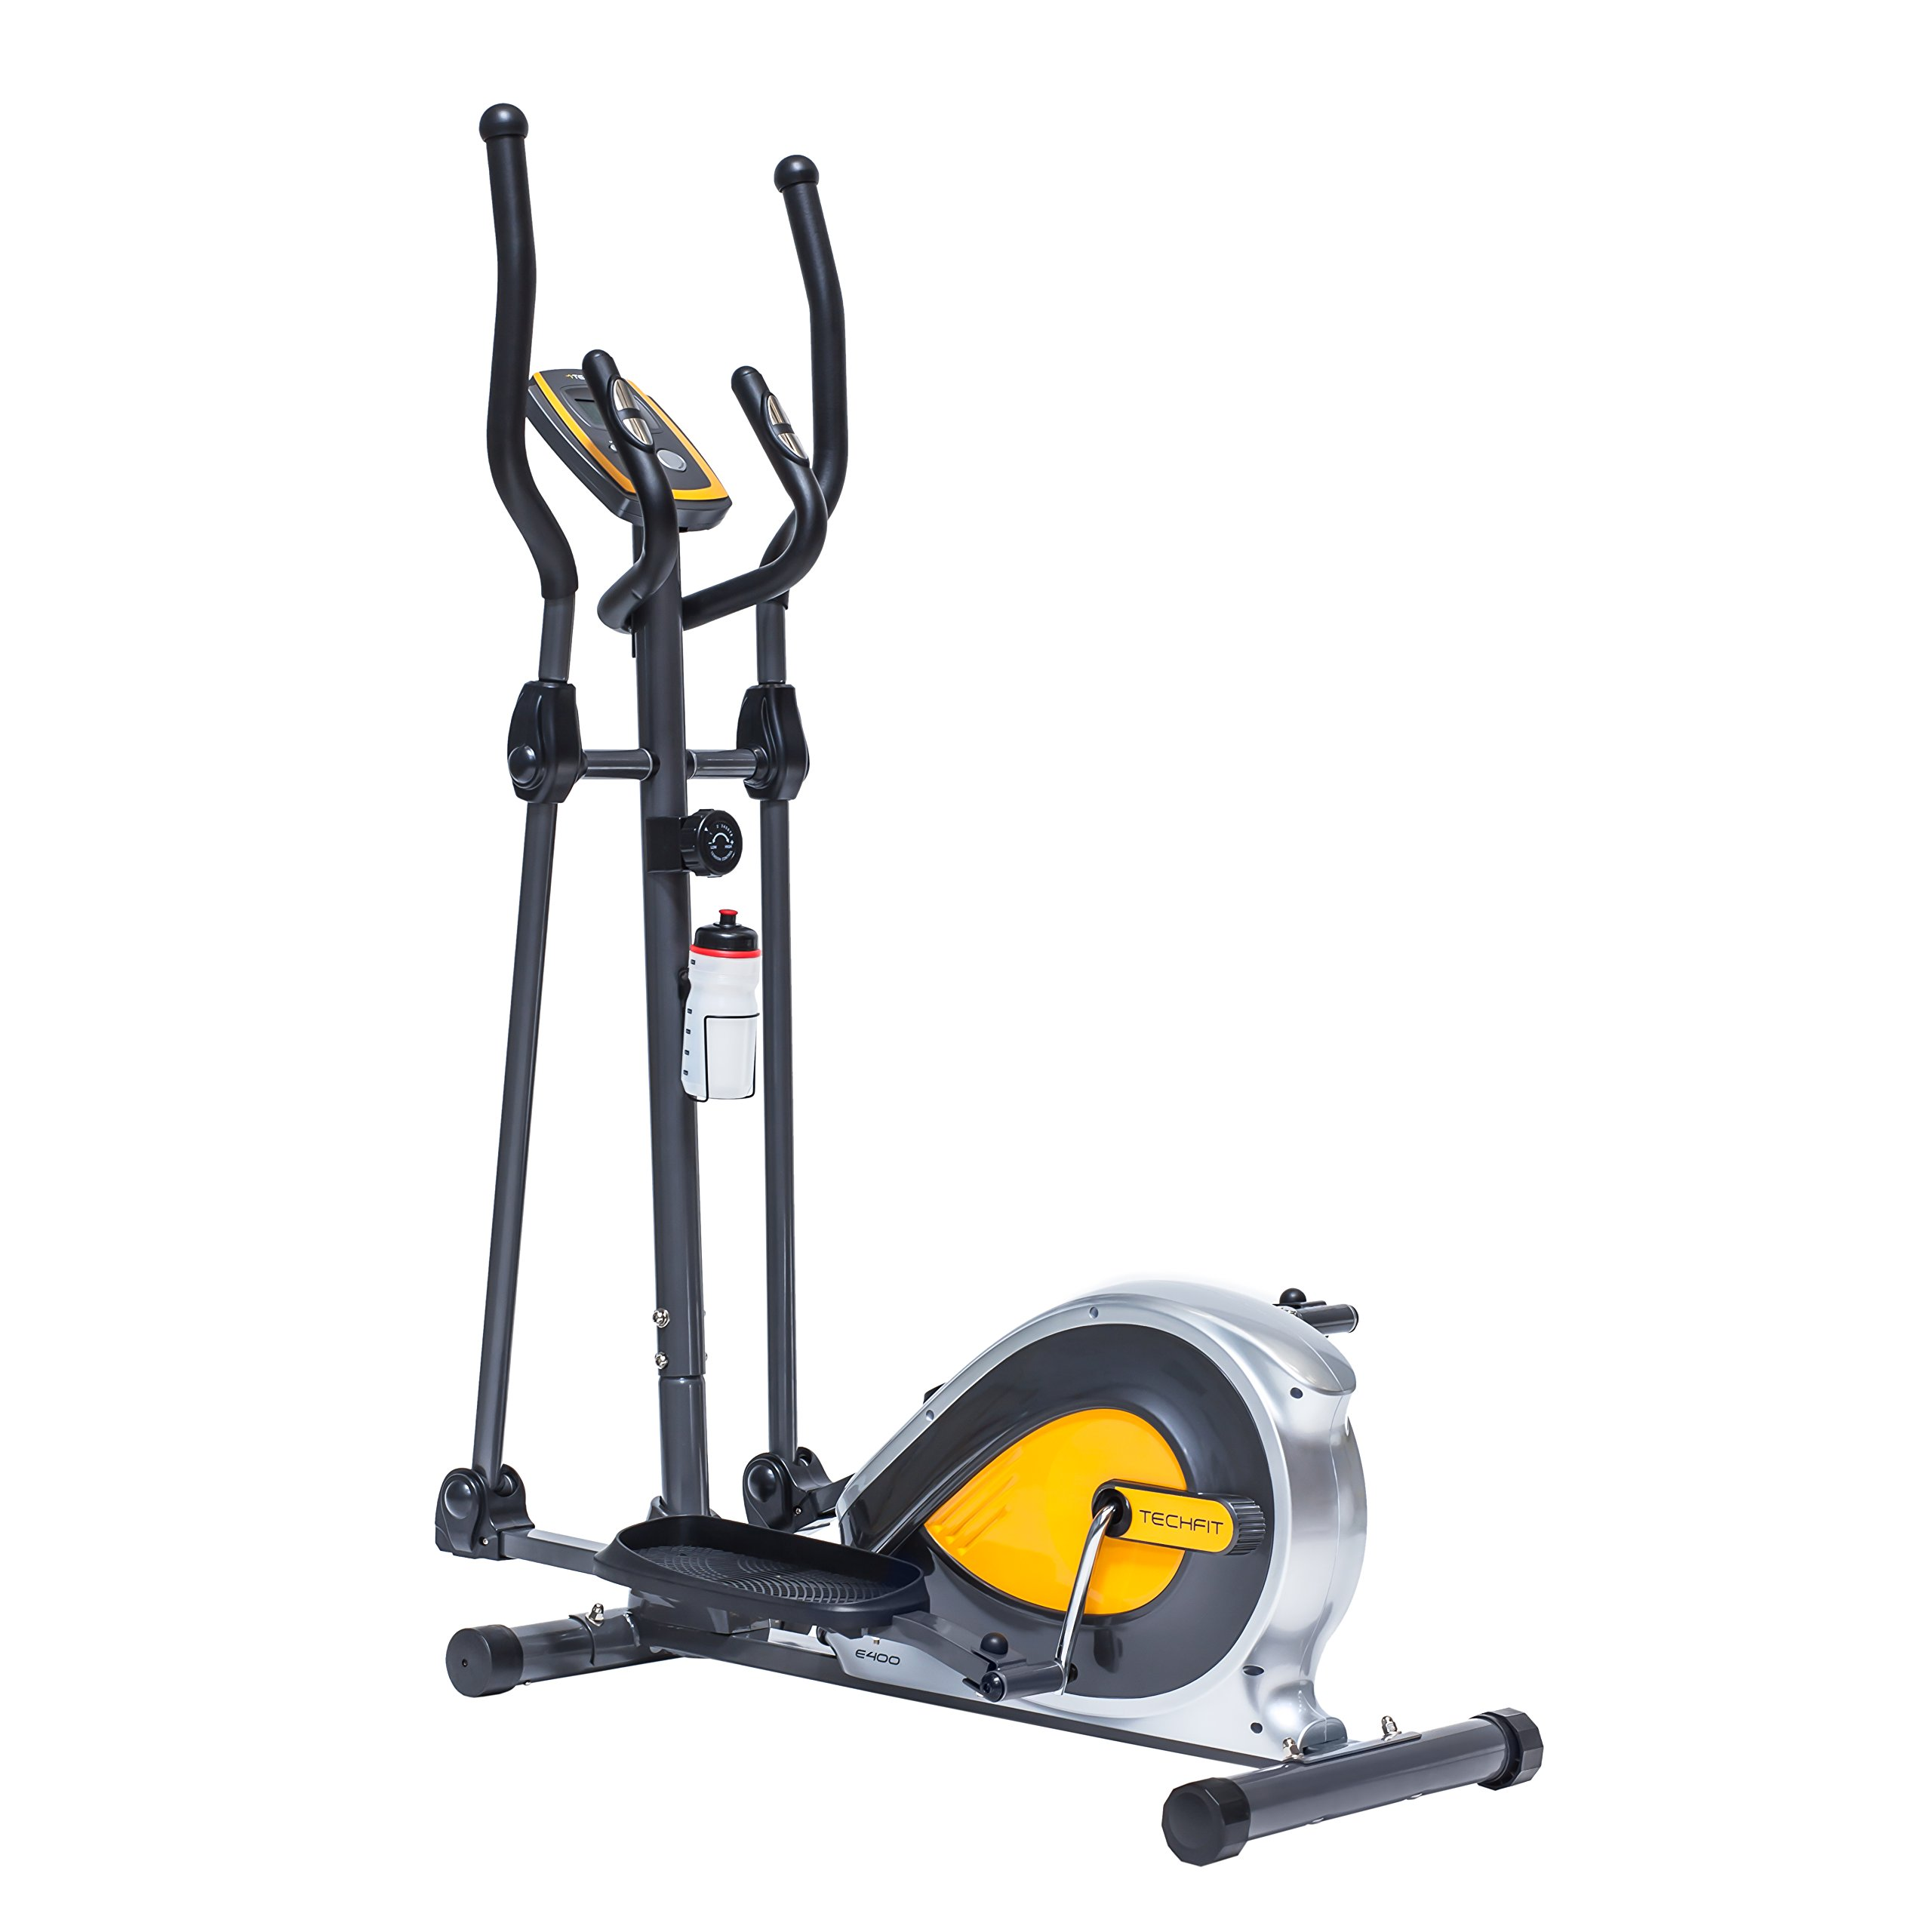 Techfit E400 Cross Trainer Elliptical Bike Home Weight Loss